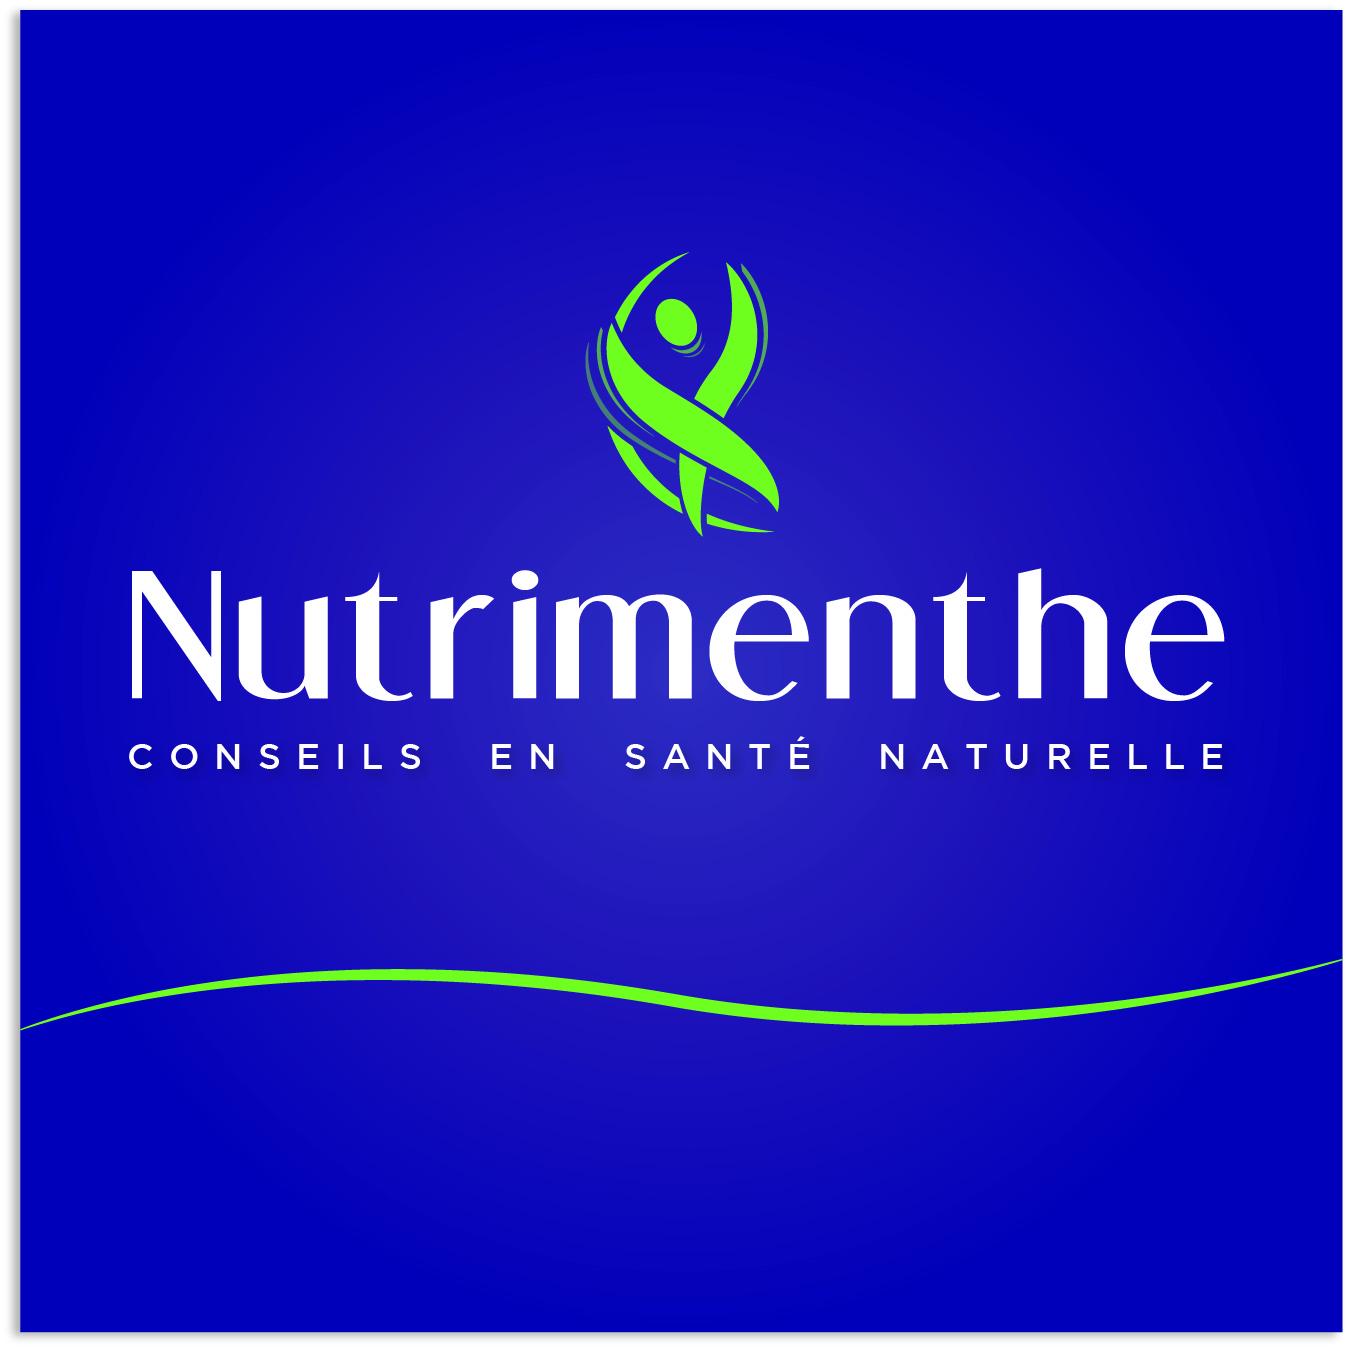 NUTRIMENTHE